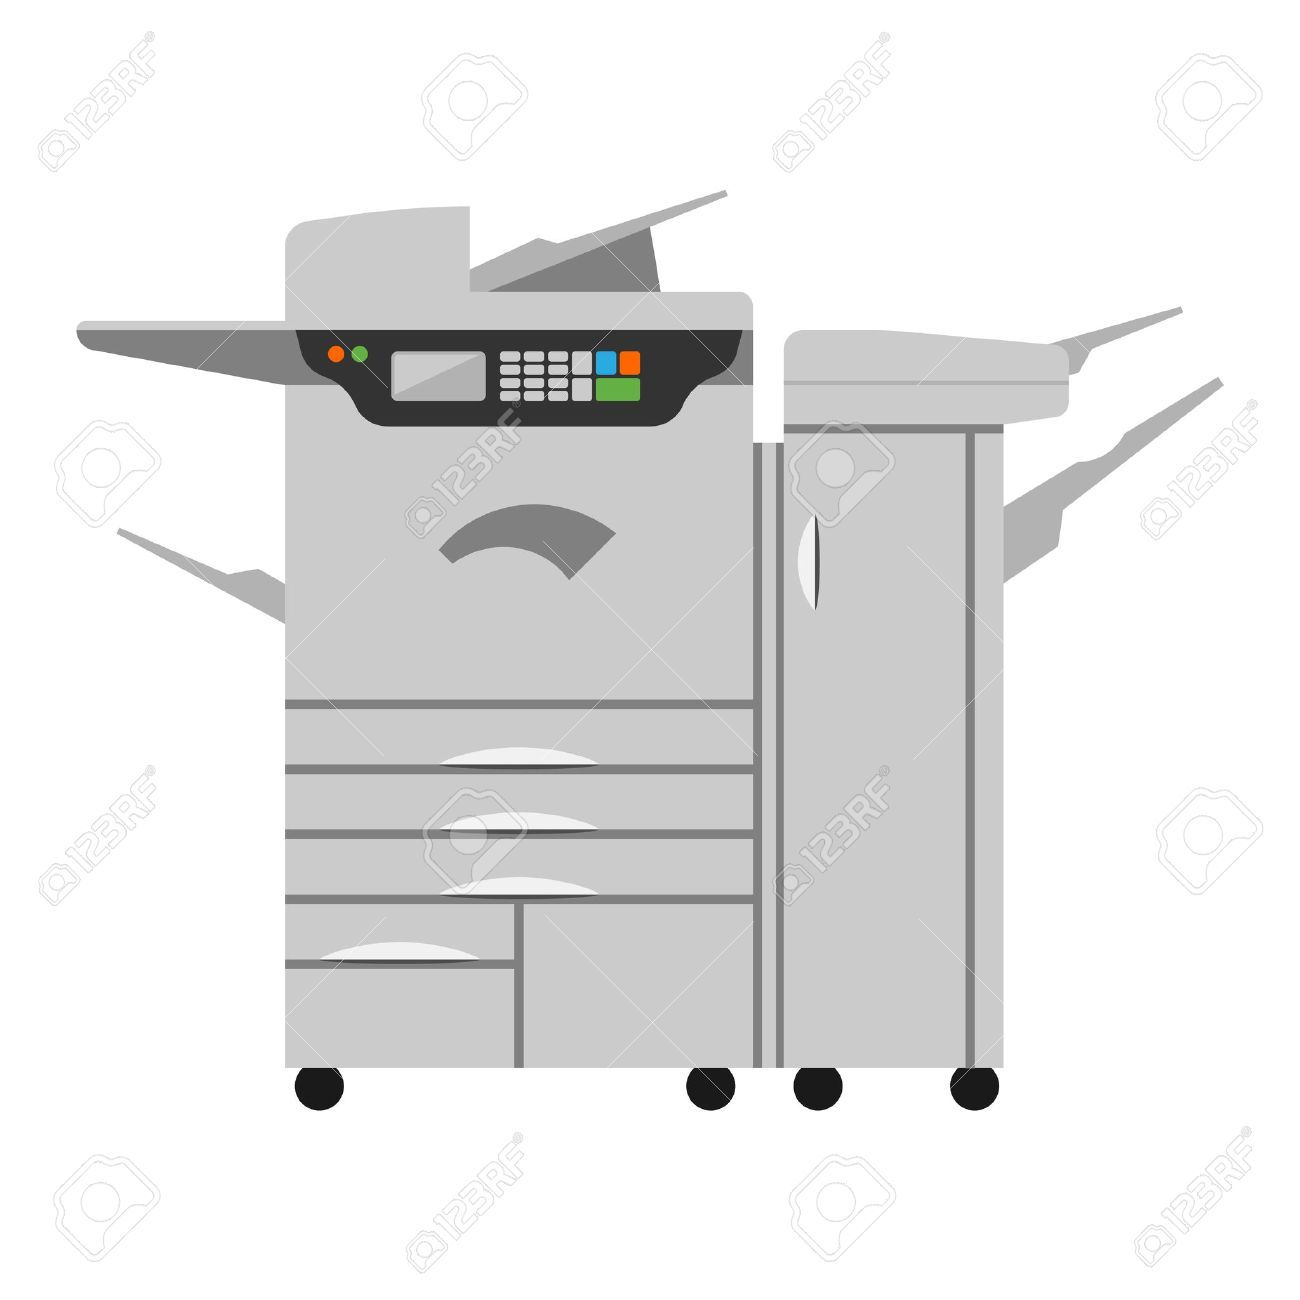 Photocopy machine clipart 7 » Clipart Portal.